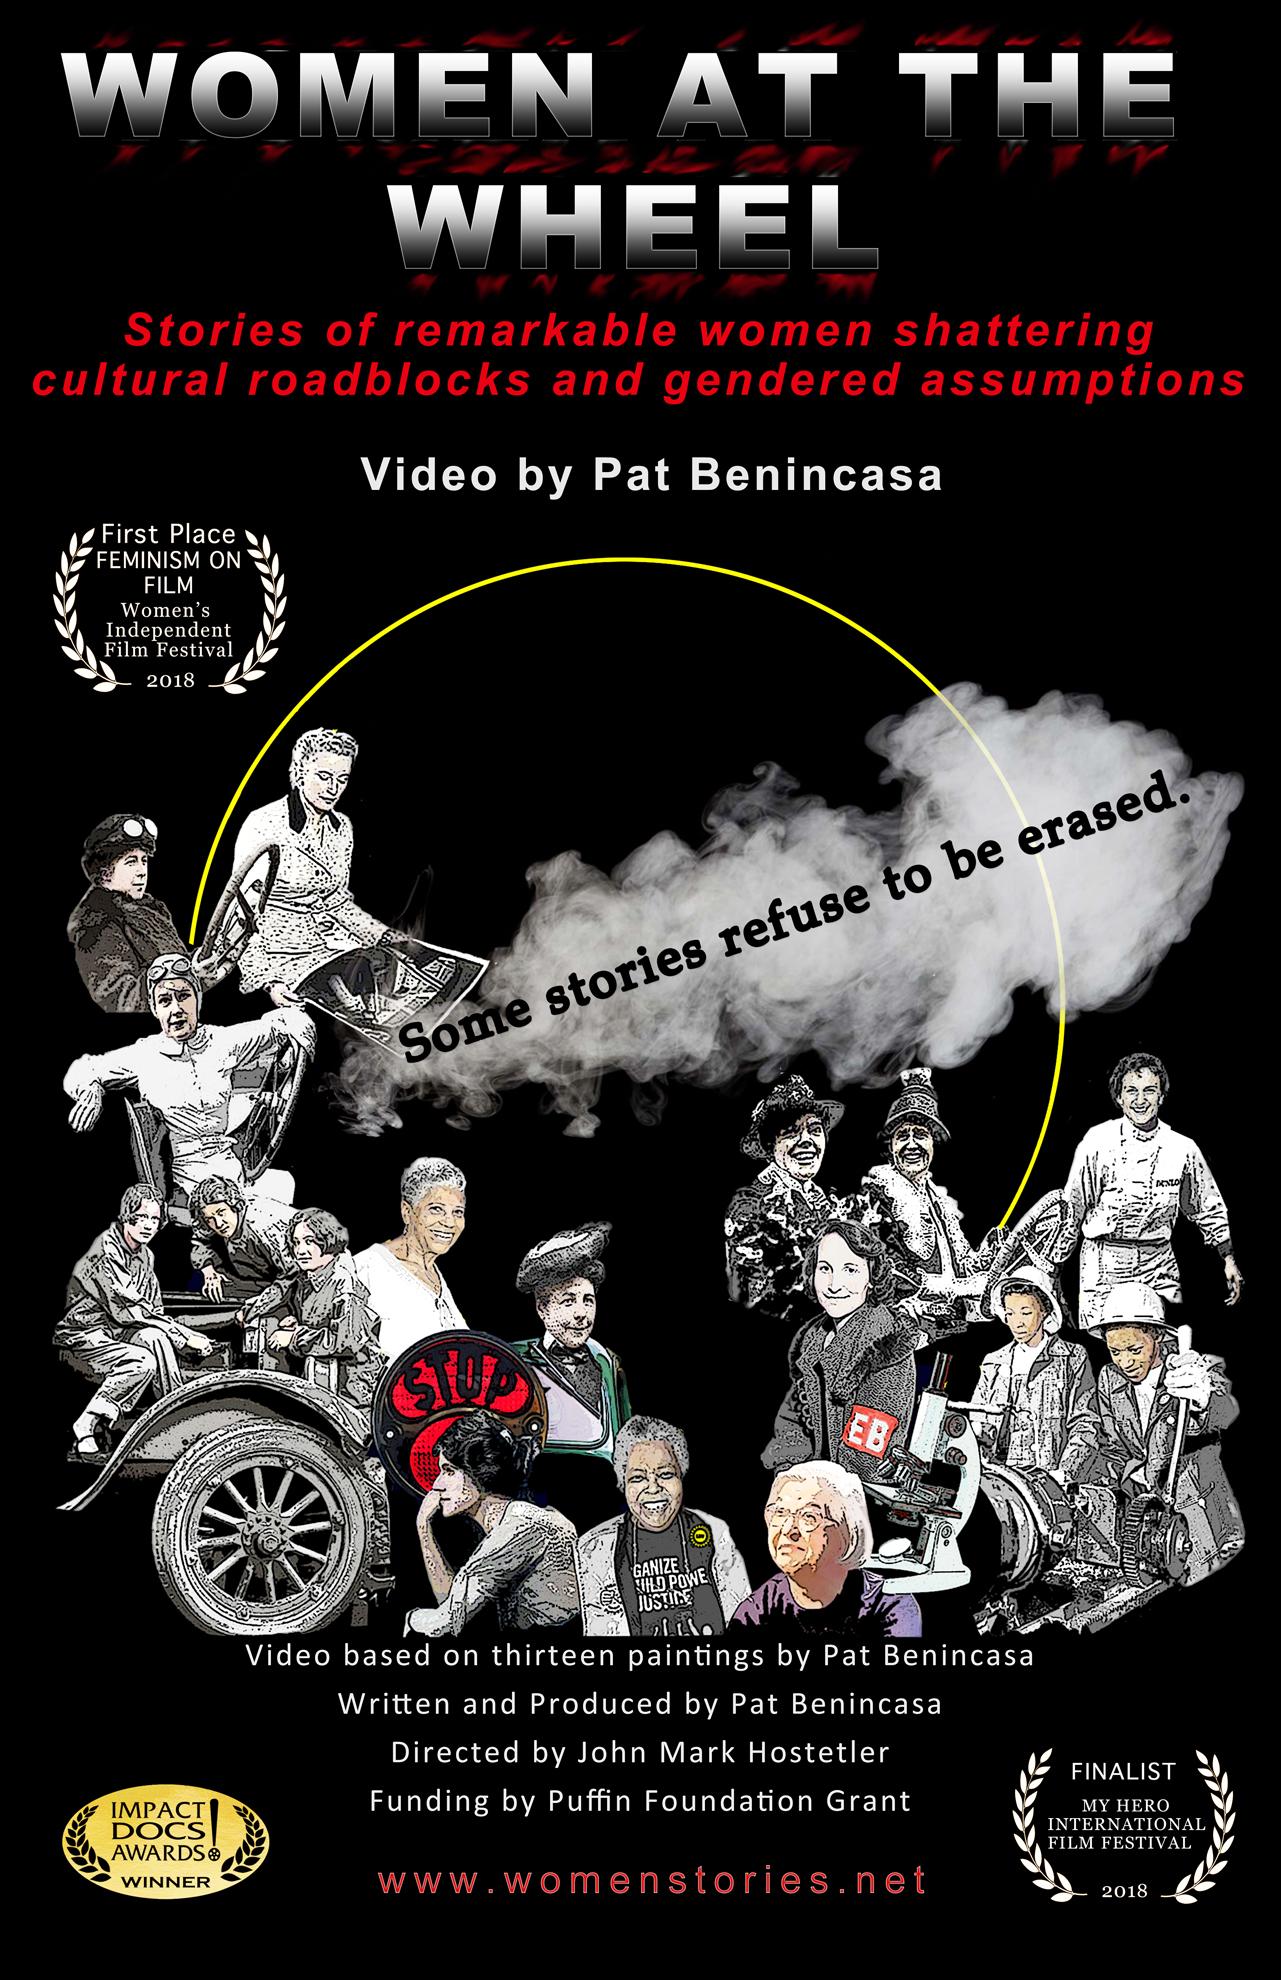 Pat Benincasa_WATW Poster _web.jpg